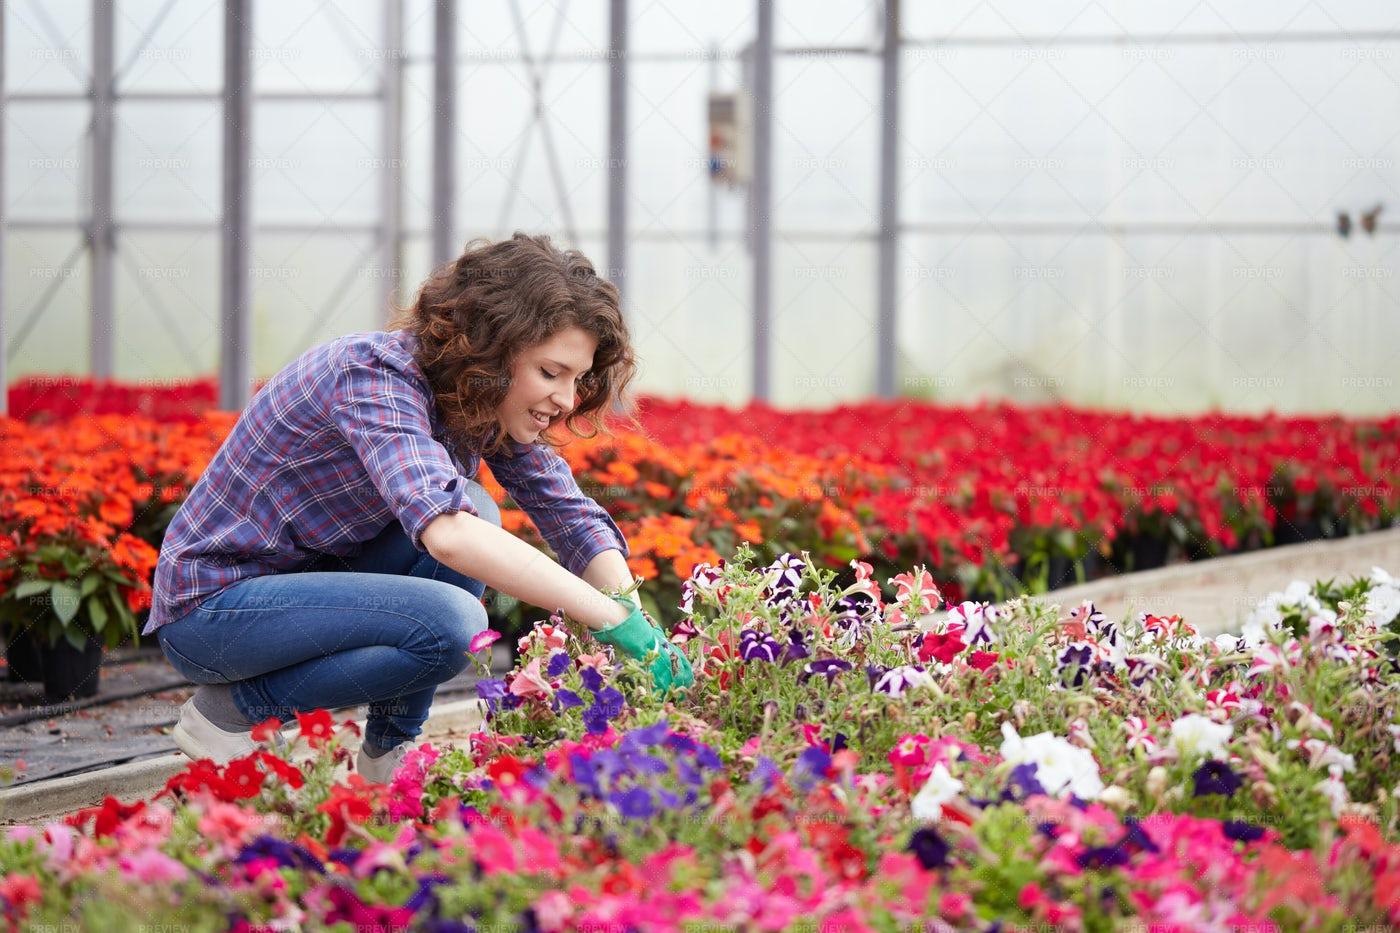 Woman Trimming Plants: Stock Photos